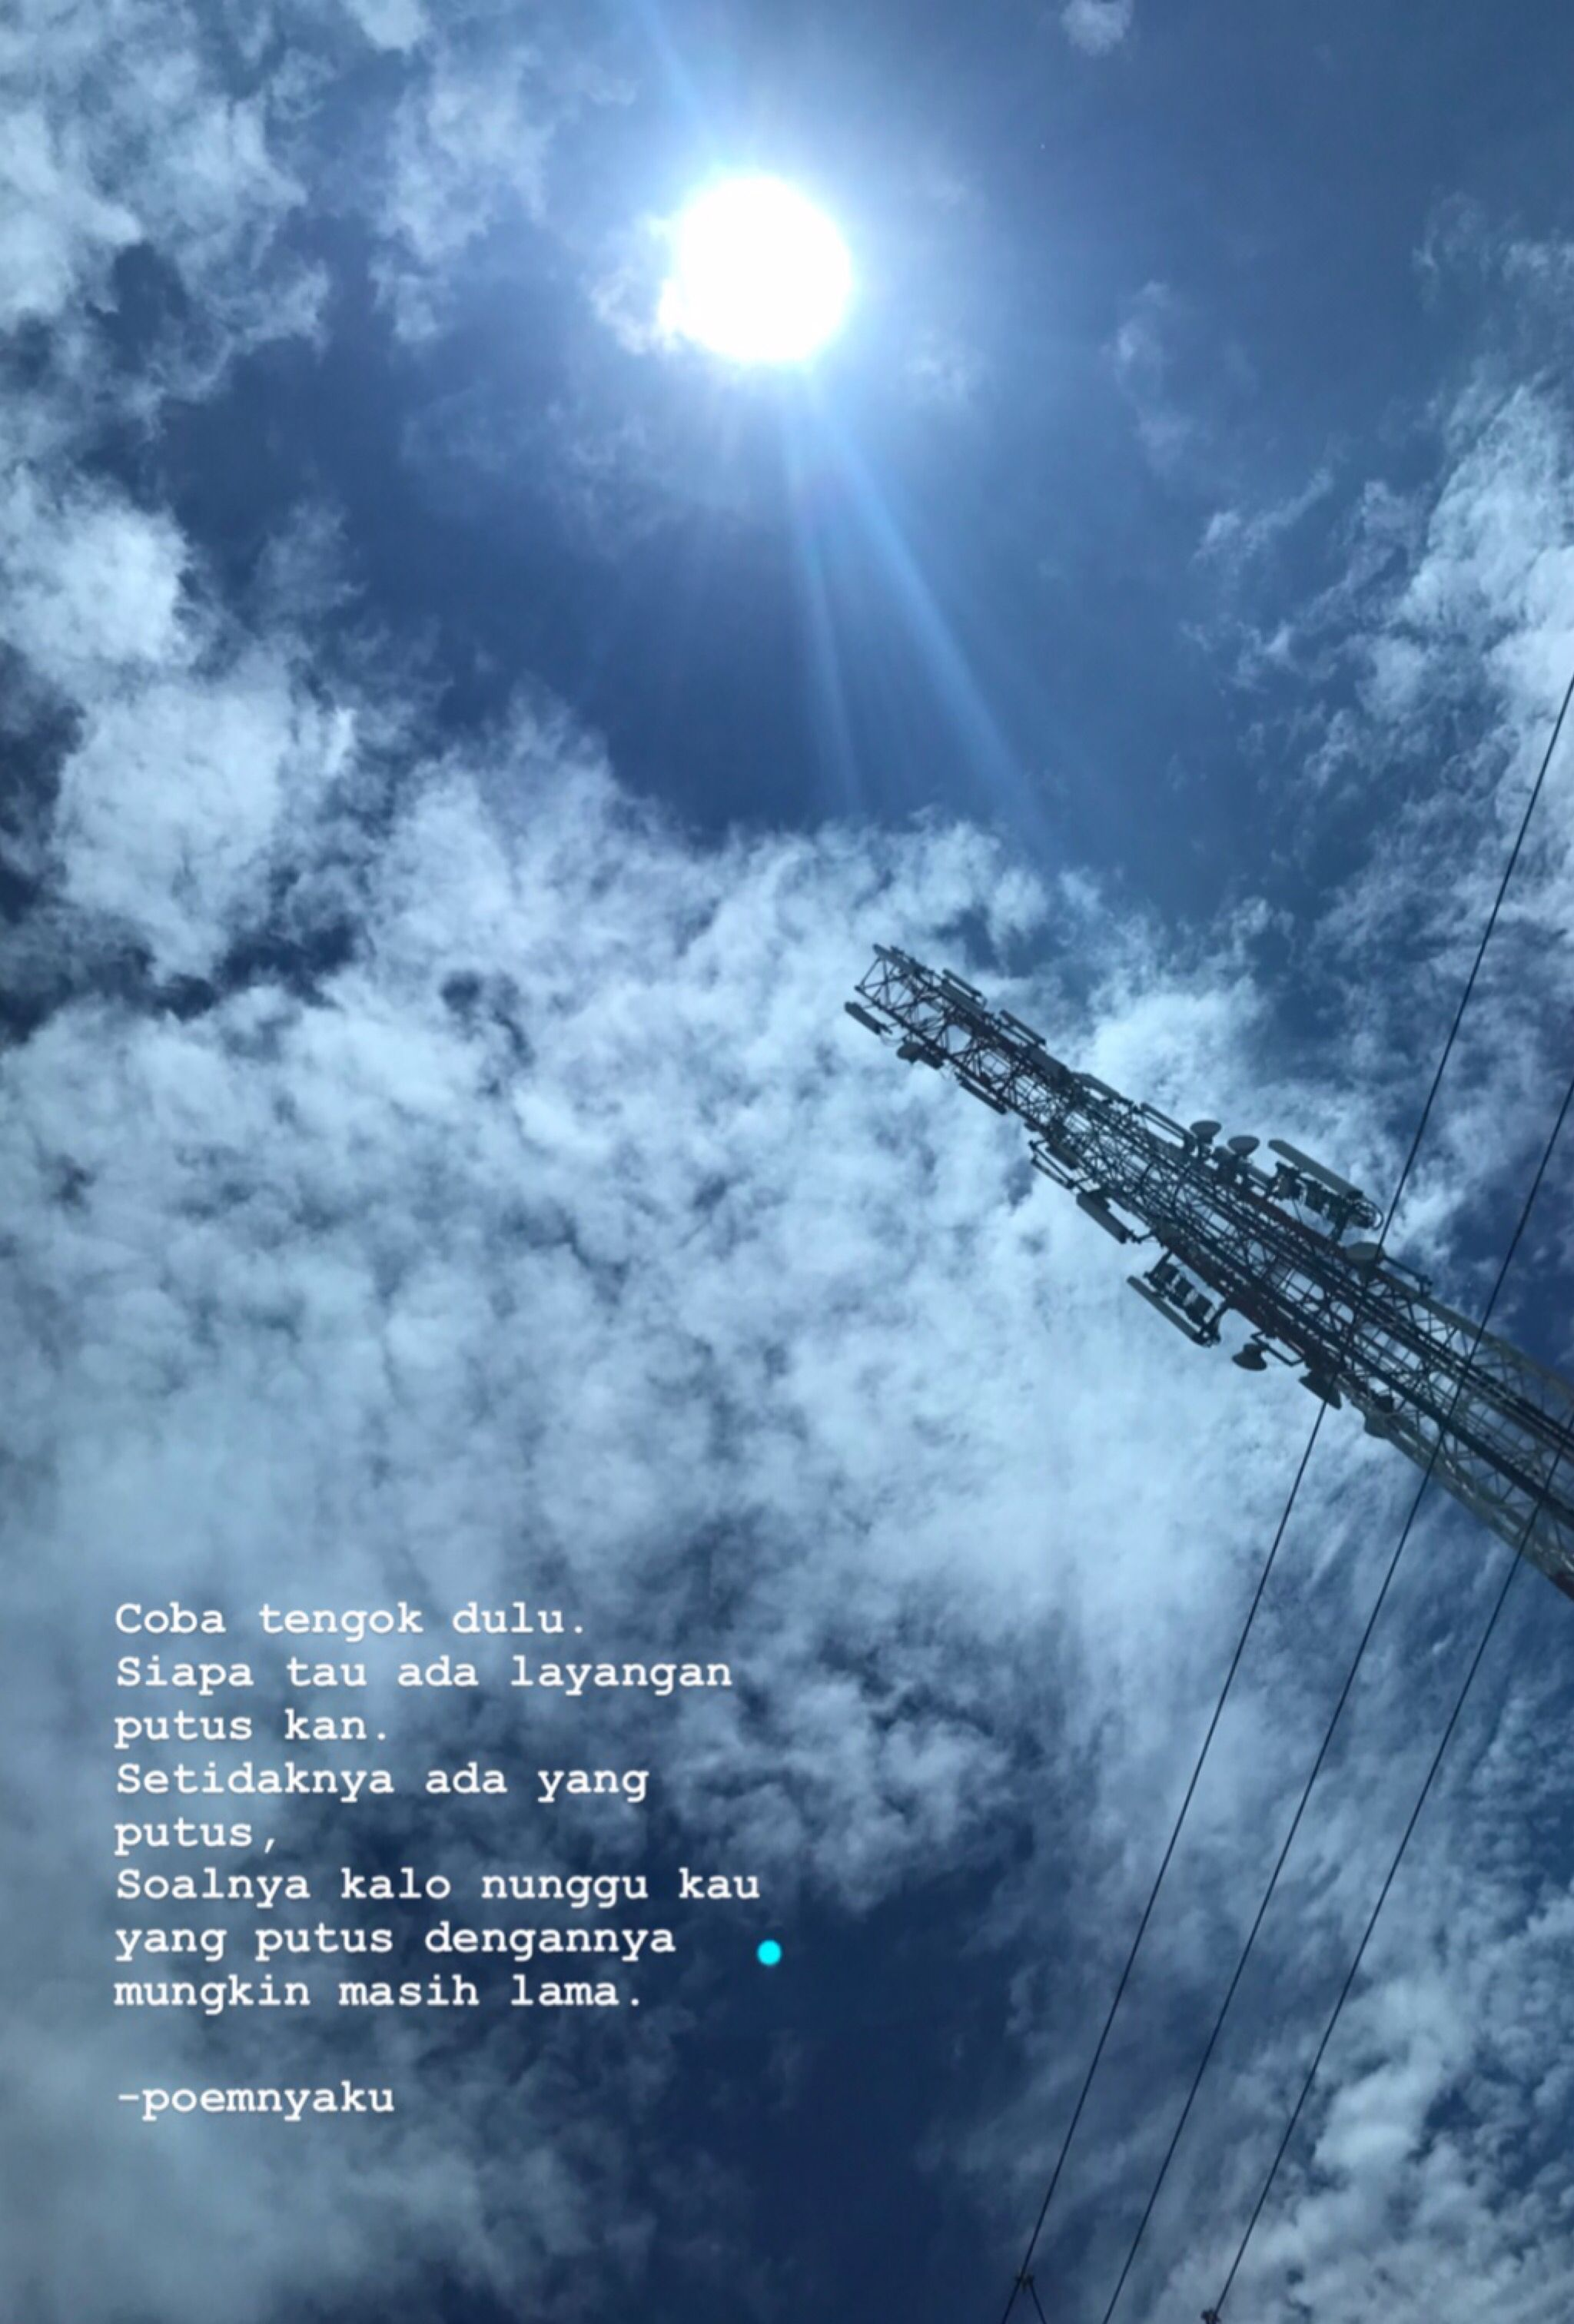 Pin Oleh Poemnyaku Di Catatan Kakiku Poemnyaku By Novilia Langit Biru Langit Sajak